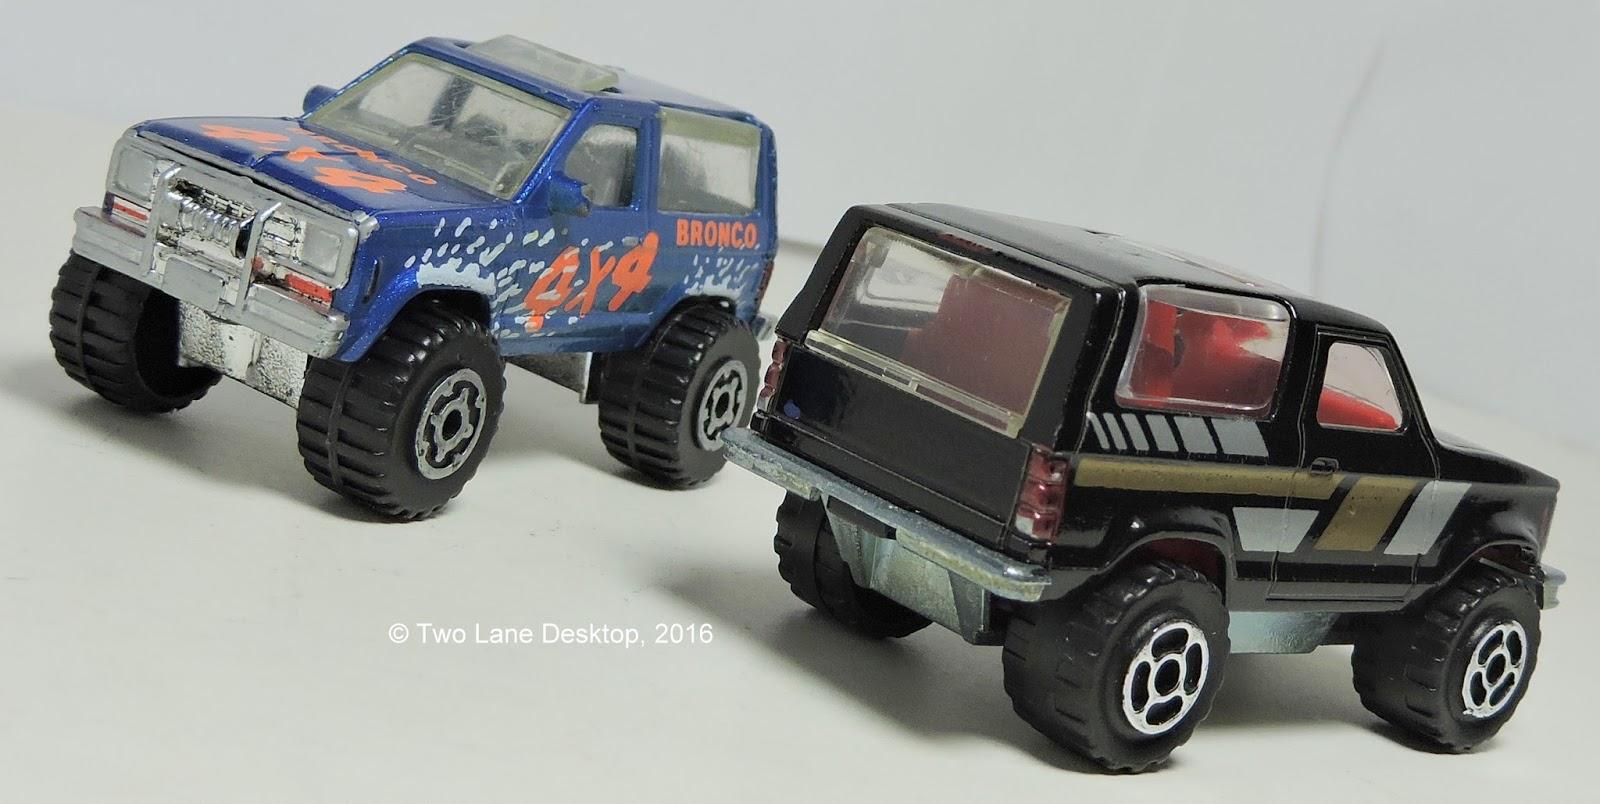 Majorette And Matchbox Ford Bronco Ii Two Lane Desktop Smaller Based On The Ranger Platform Was Precursor To Explorer Heres Different Versions Of In Diecast